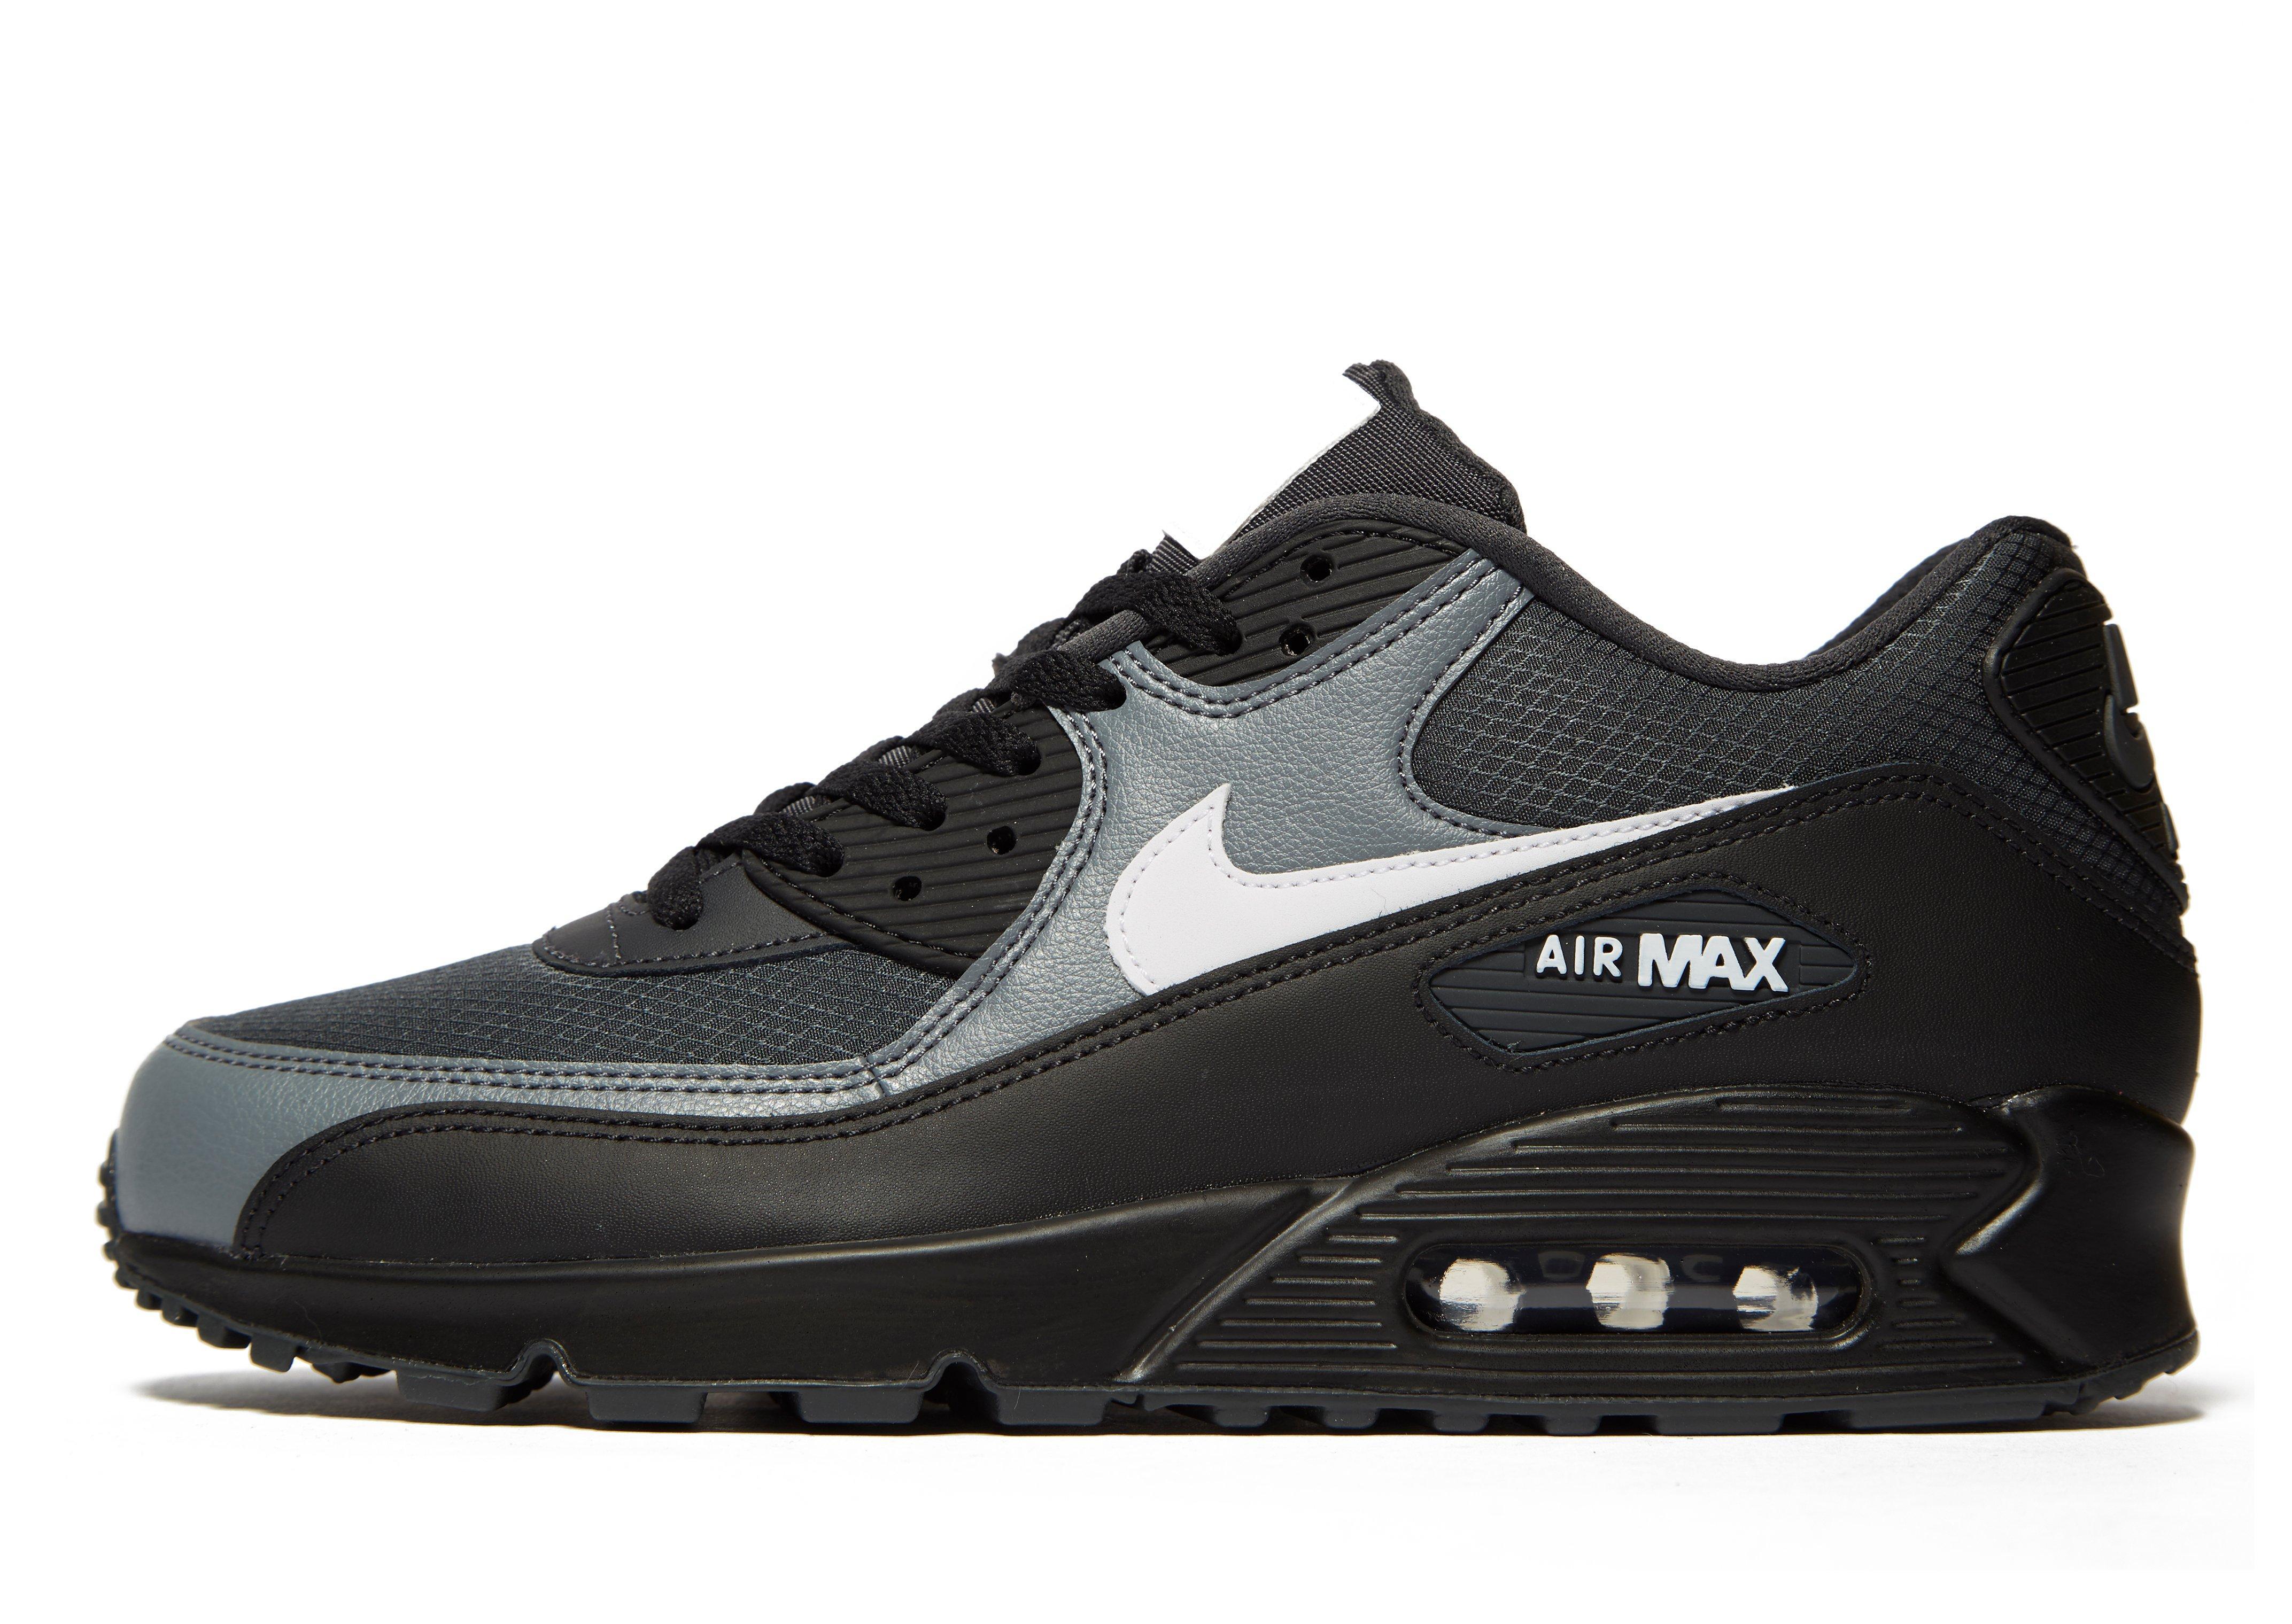 Air Max 90 Noir Essentiel toutes tailles DqIA2t